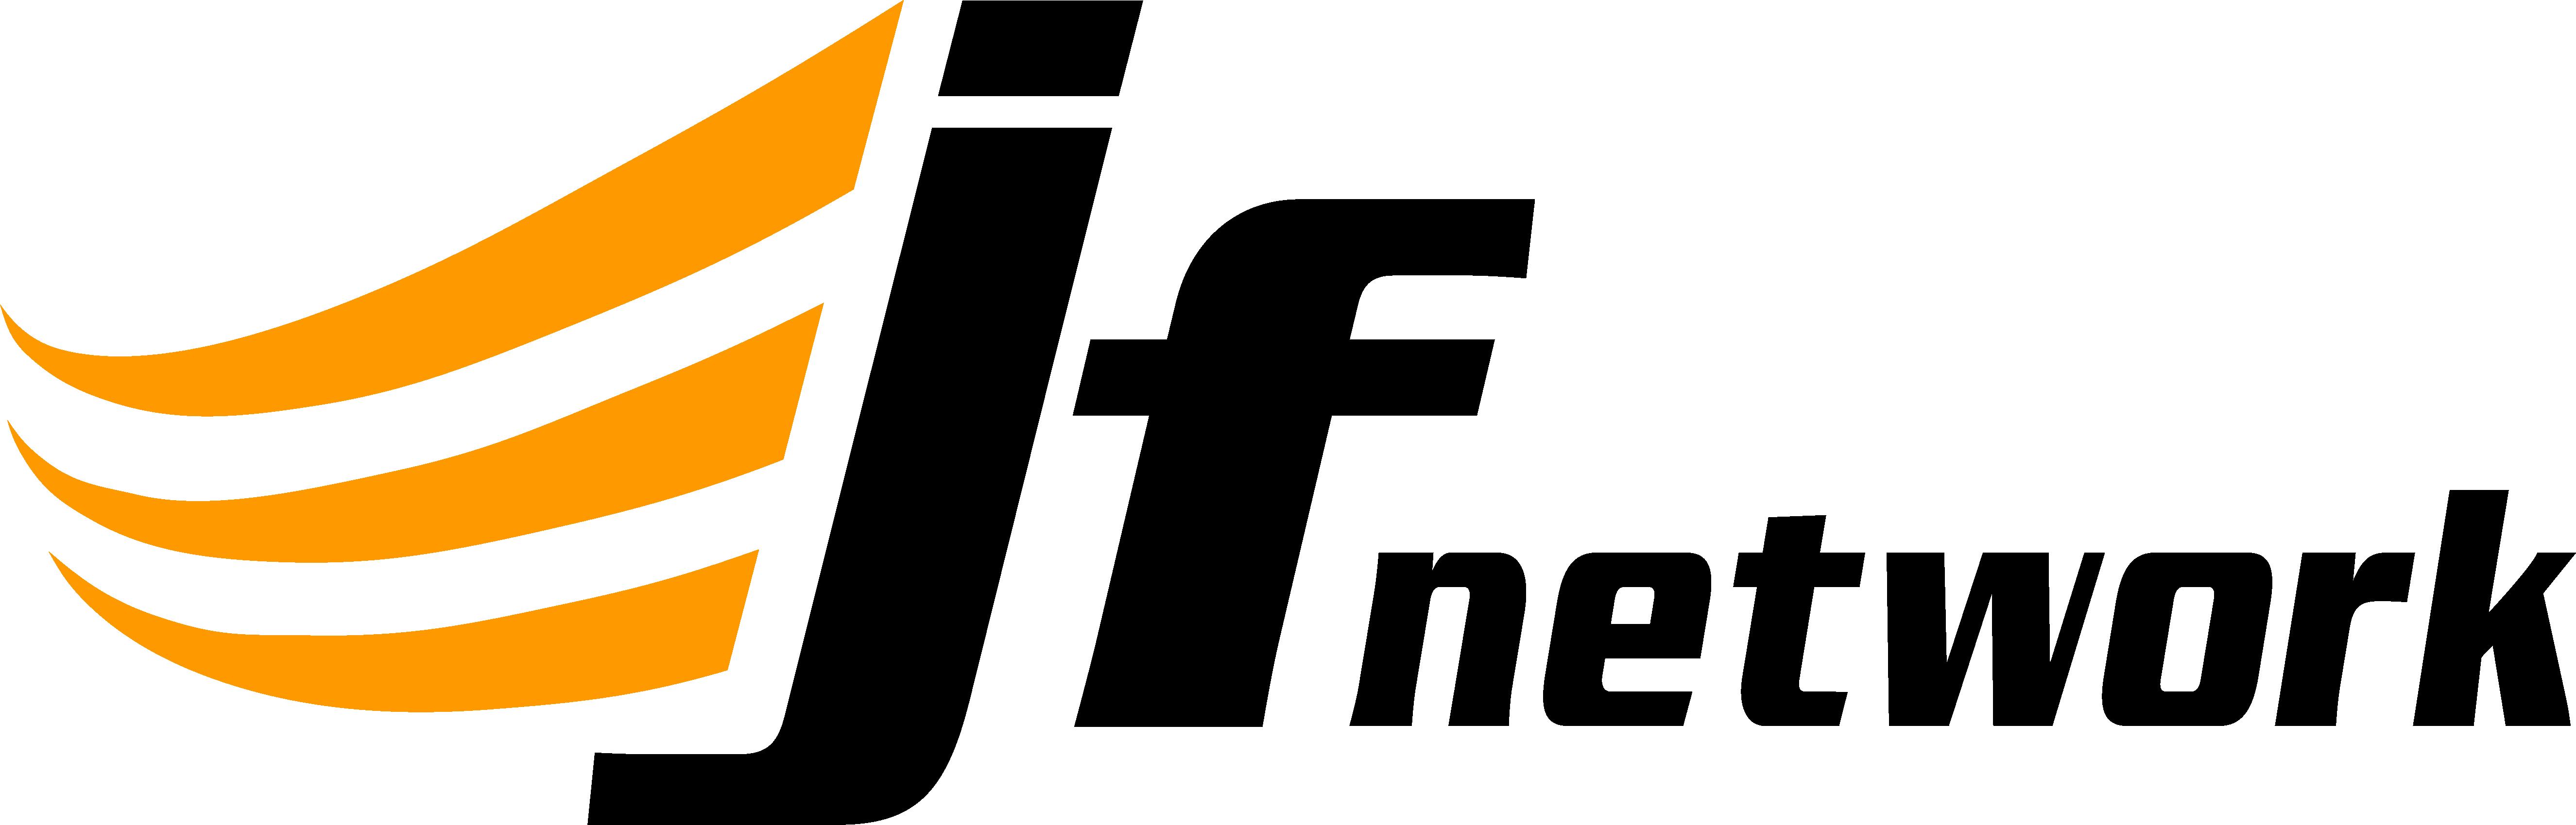 jfnetwork_logo